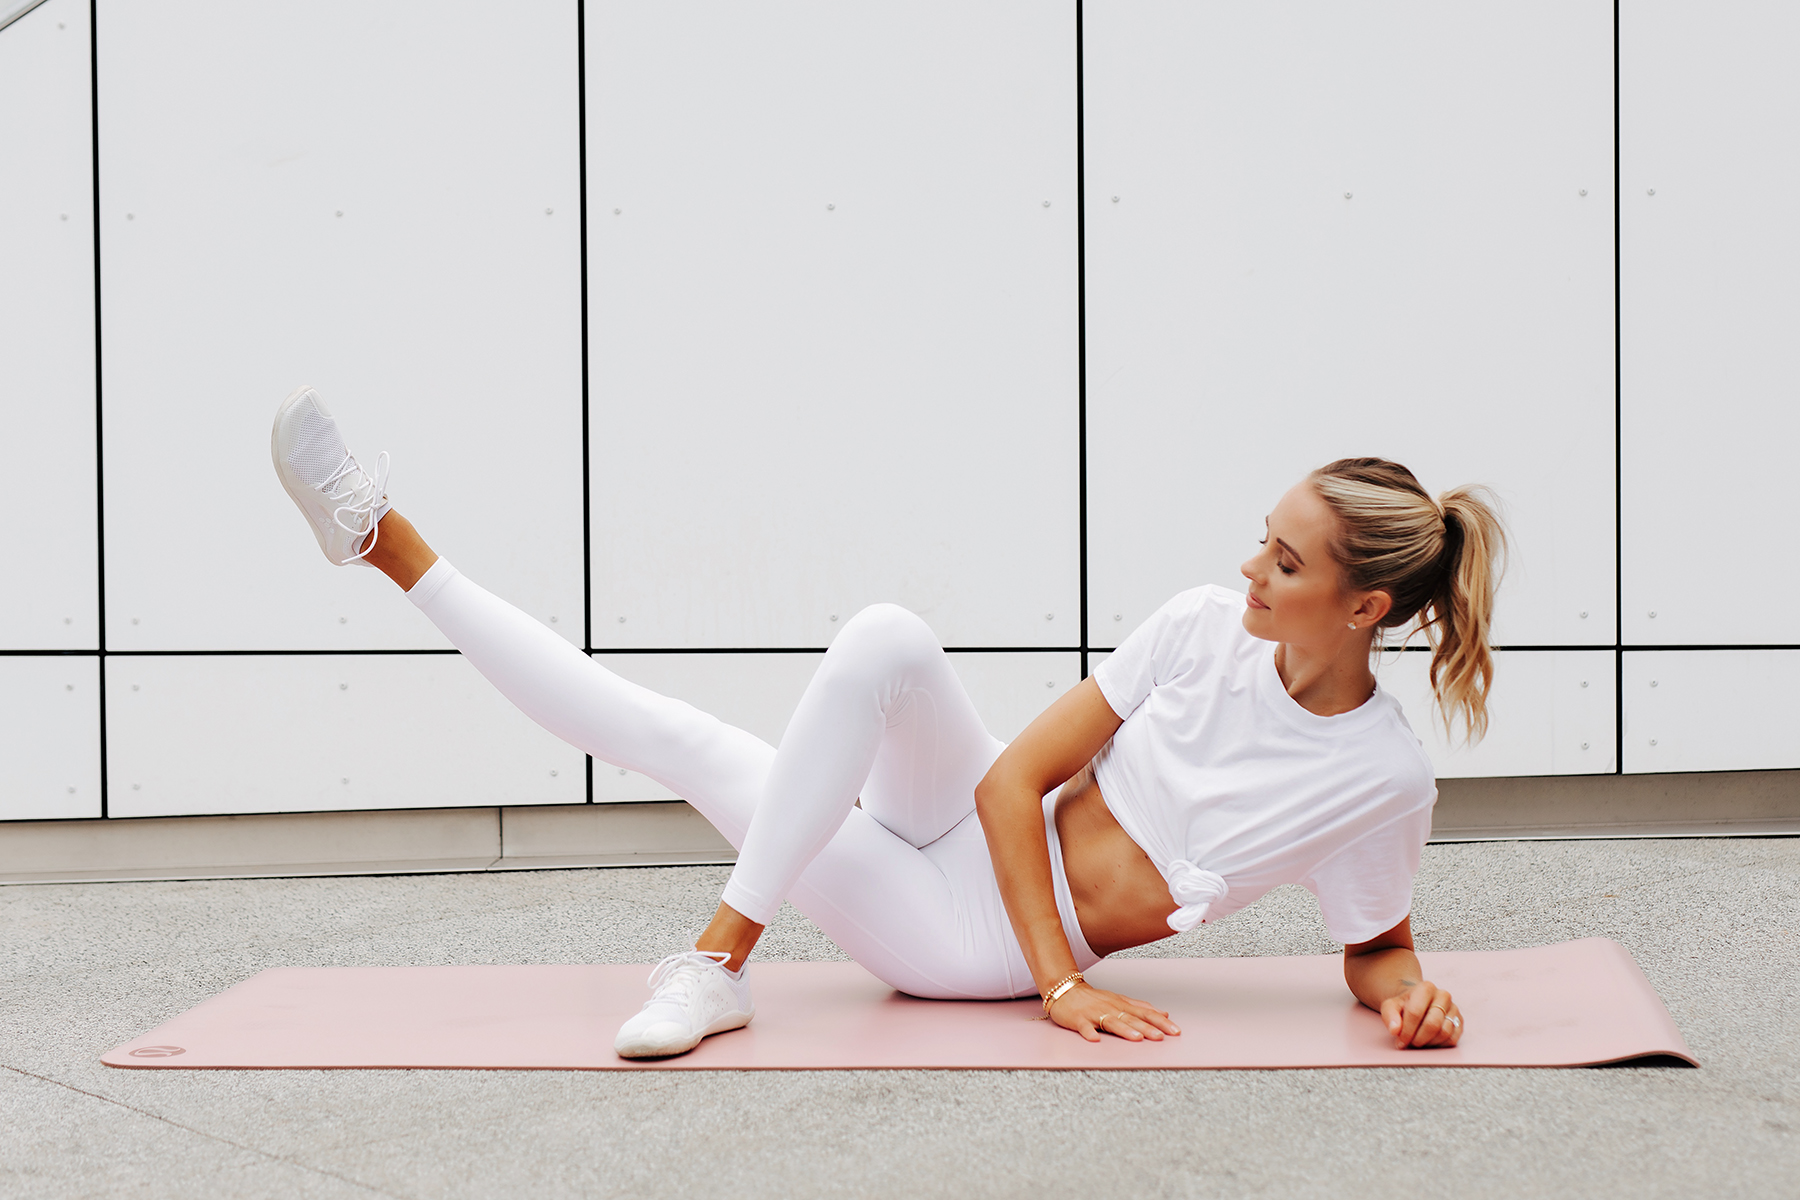 Fashion Jackson Wearing lululemon White Tshirt lululemon White Align Leggings White Sneakers Side Lying Hip Adduction Position 2 Simple Ab Exercise